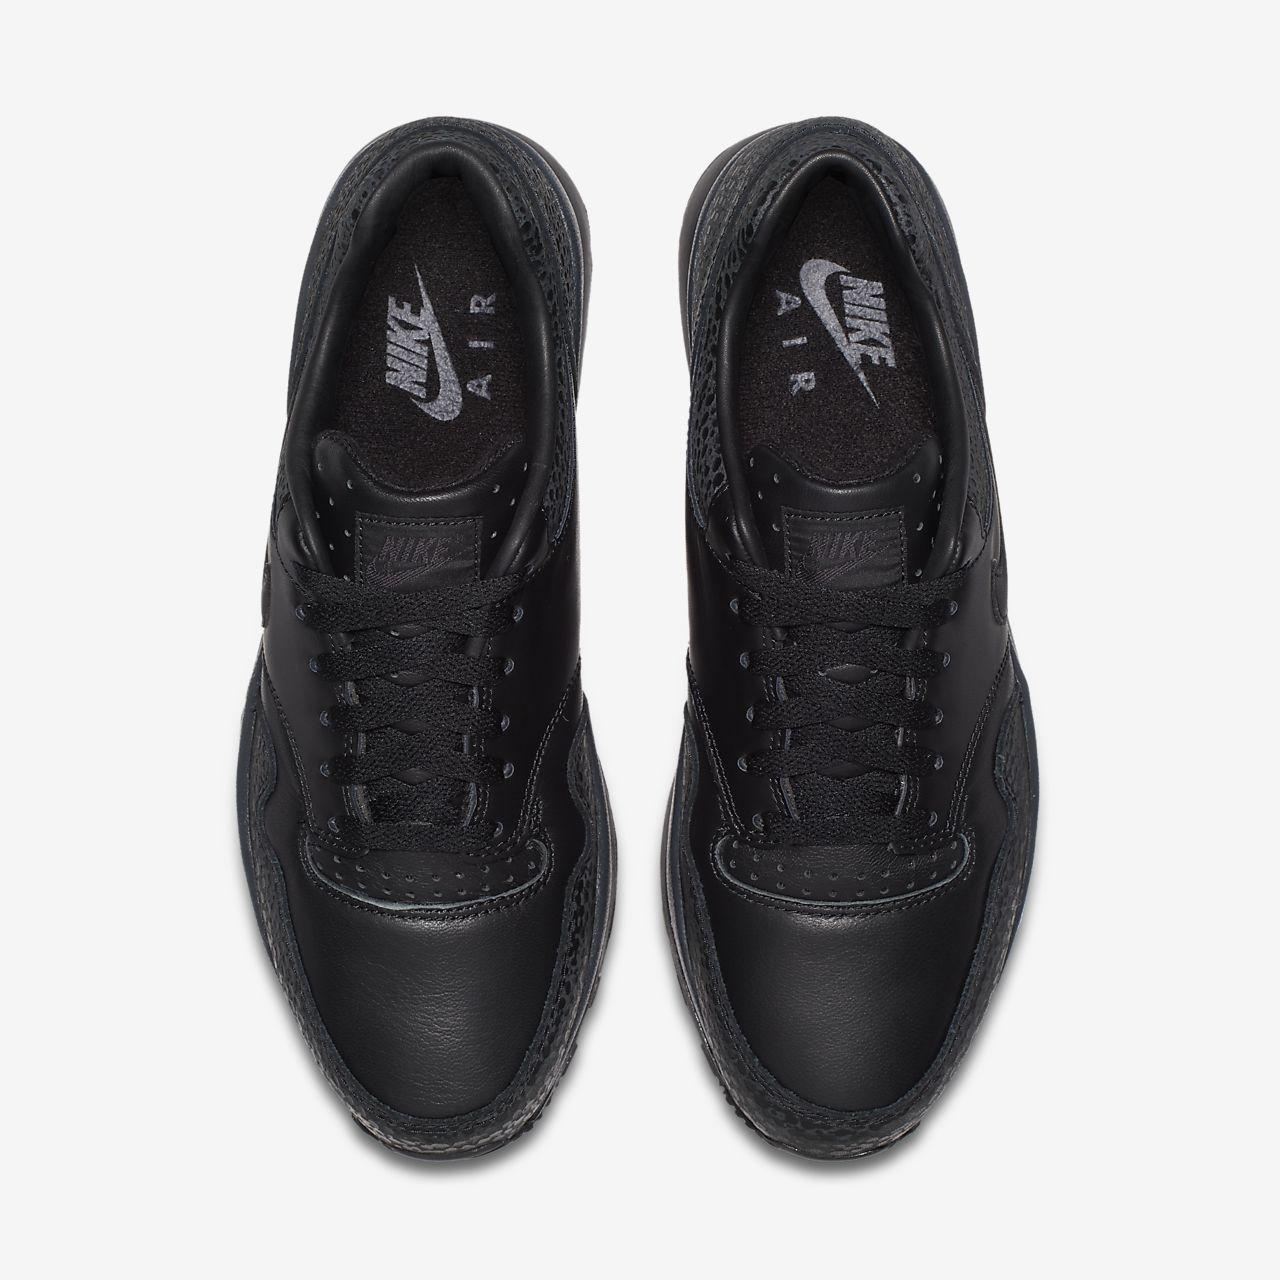 new product 5c96f 227d5 ... Nike Air Safari QS Men s Shoe